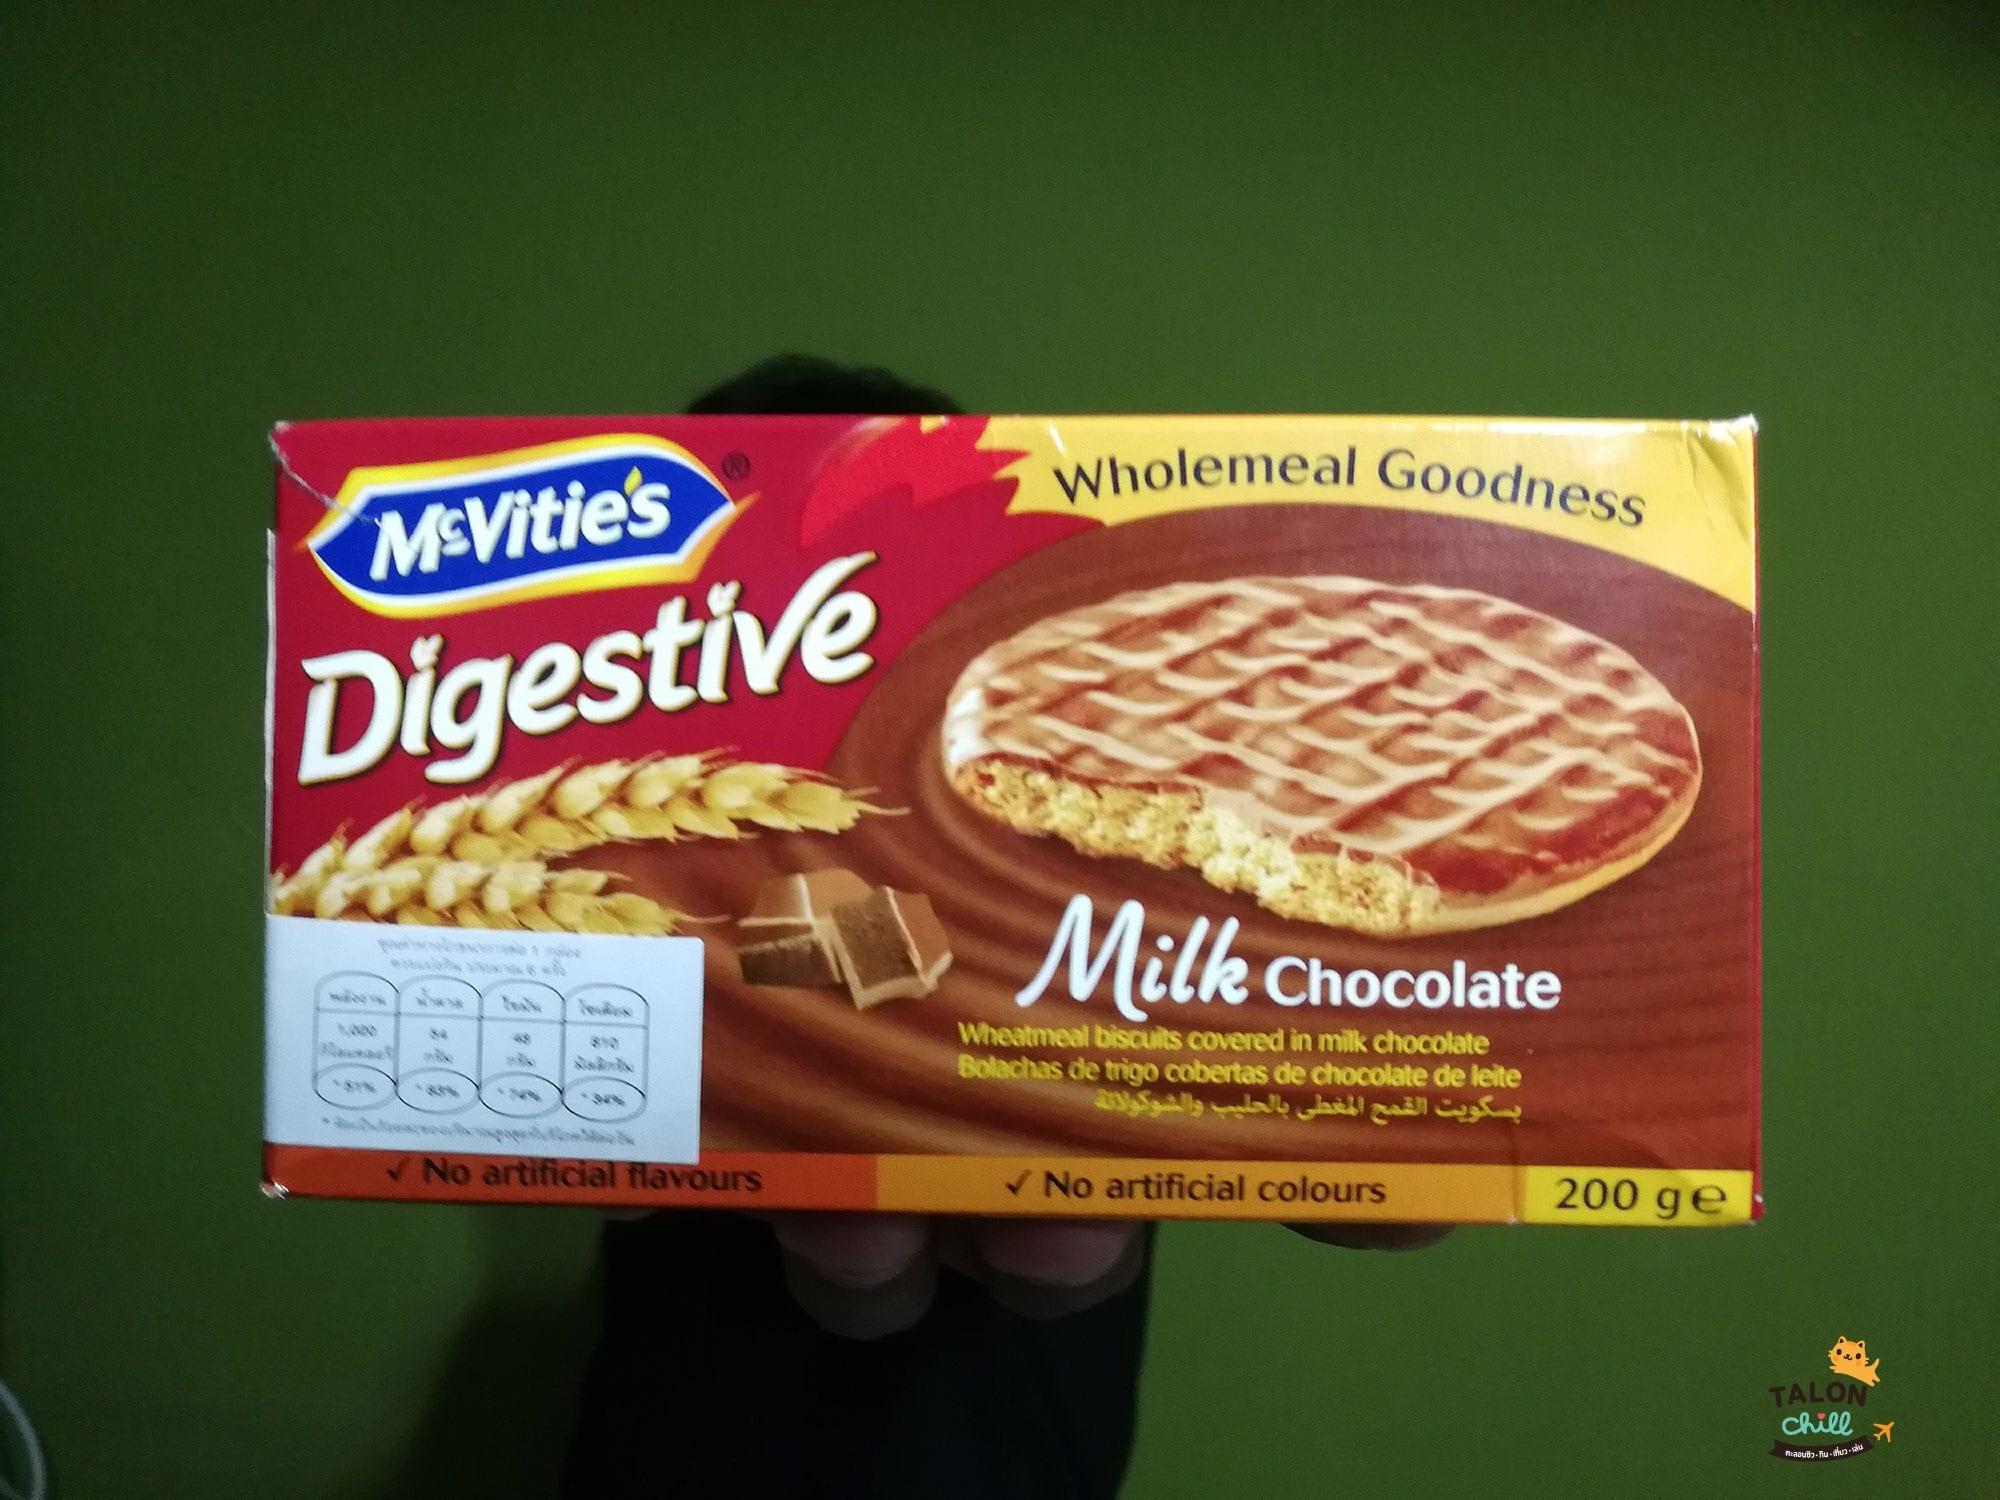 [Review] แมคไวตี้ส์ ไดเจสทีฟ บิสกิต ช็อกโกแลต (McVitie's Digestive Biscuit Chocolate)